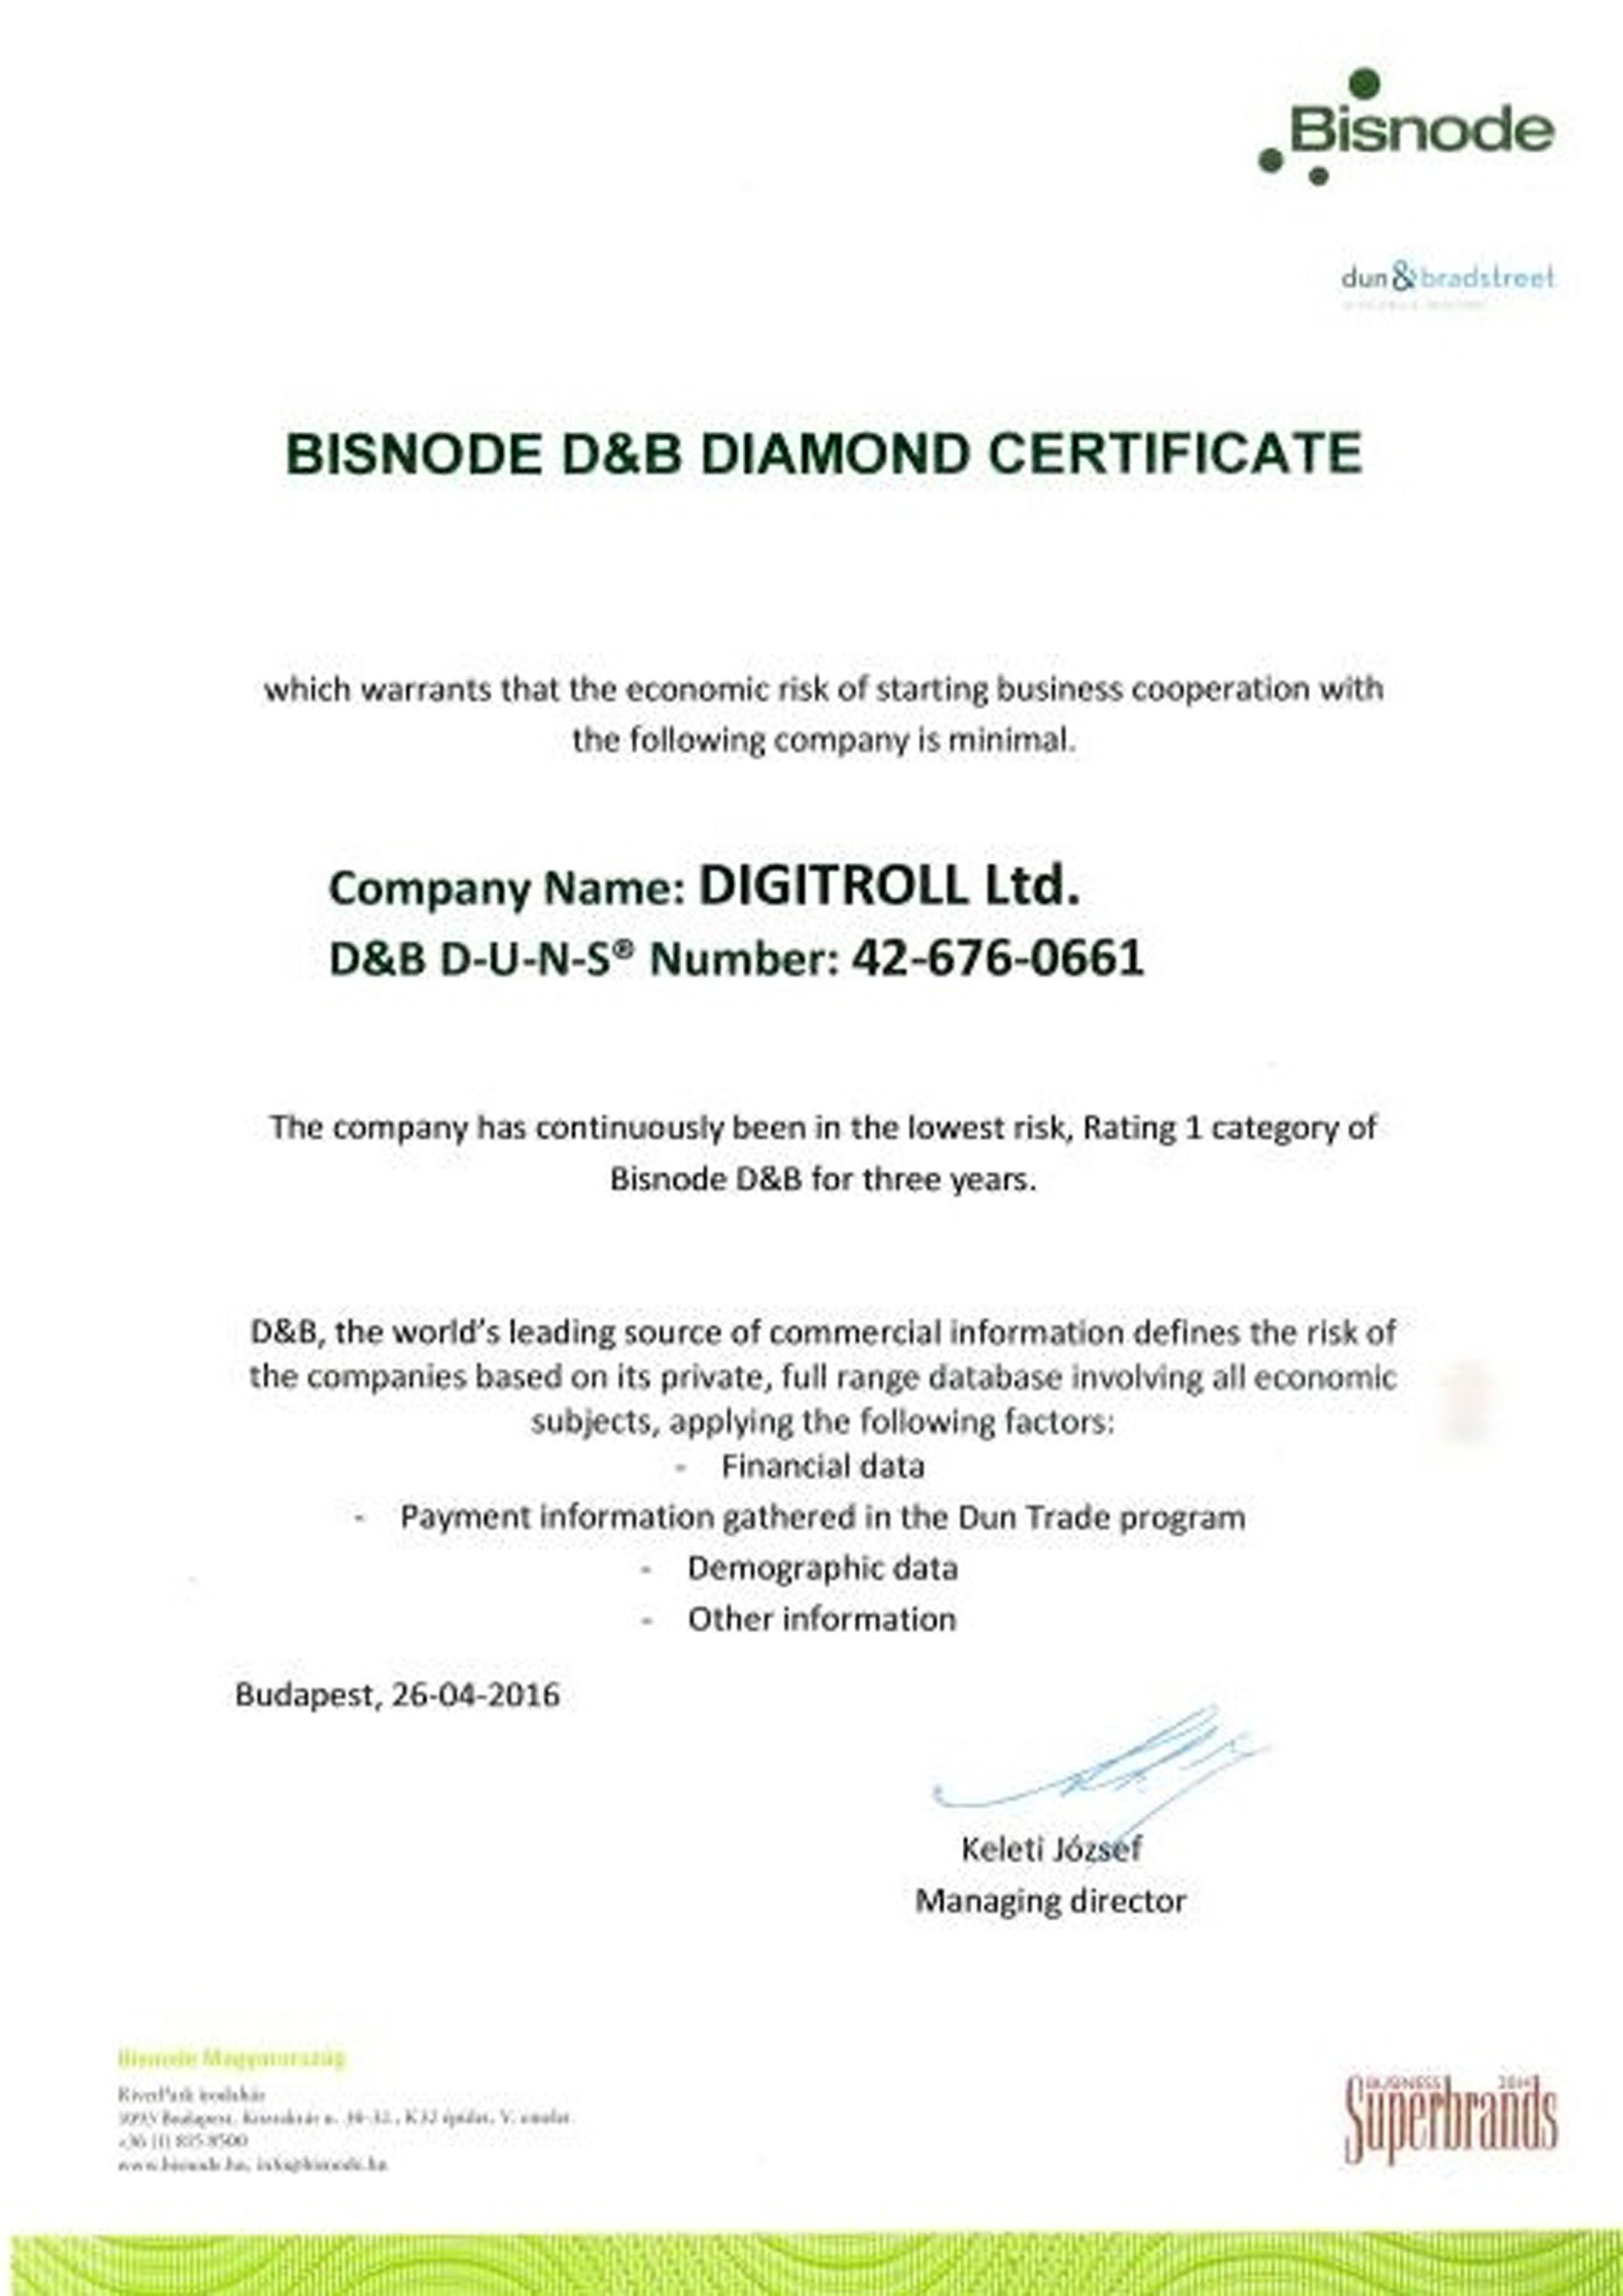 D&B Certificate | Digitroll Seeding Monitor Systems